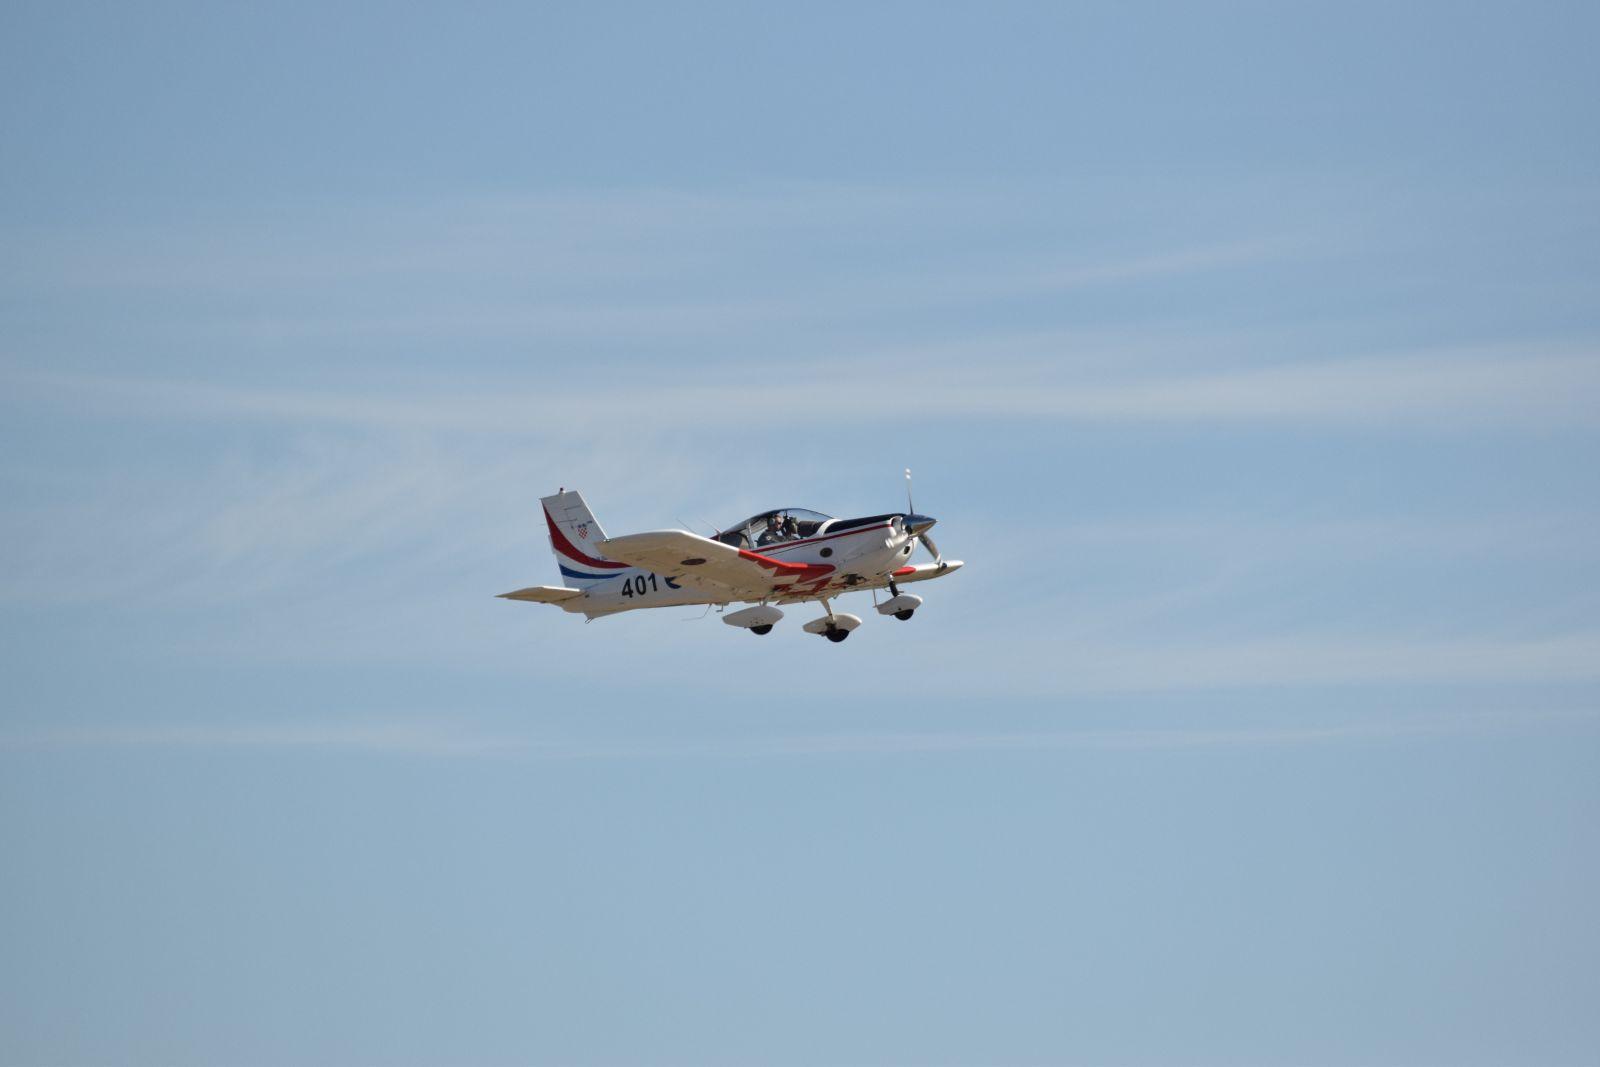 Započelo selekcijsko letenje novih naraštaja vojnih pilota